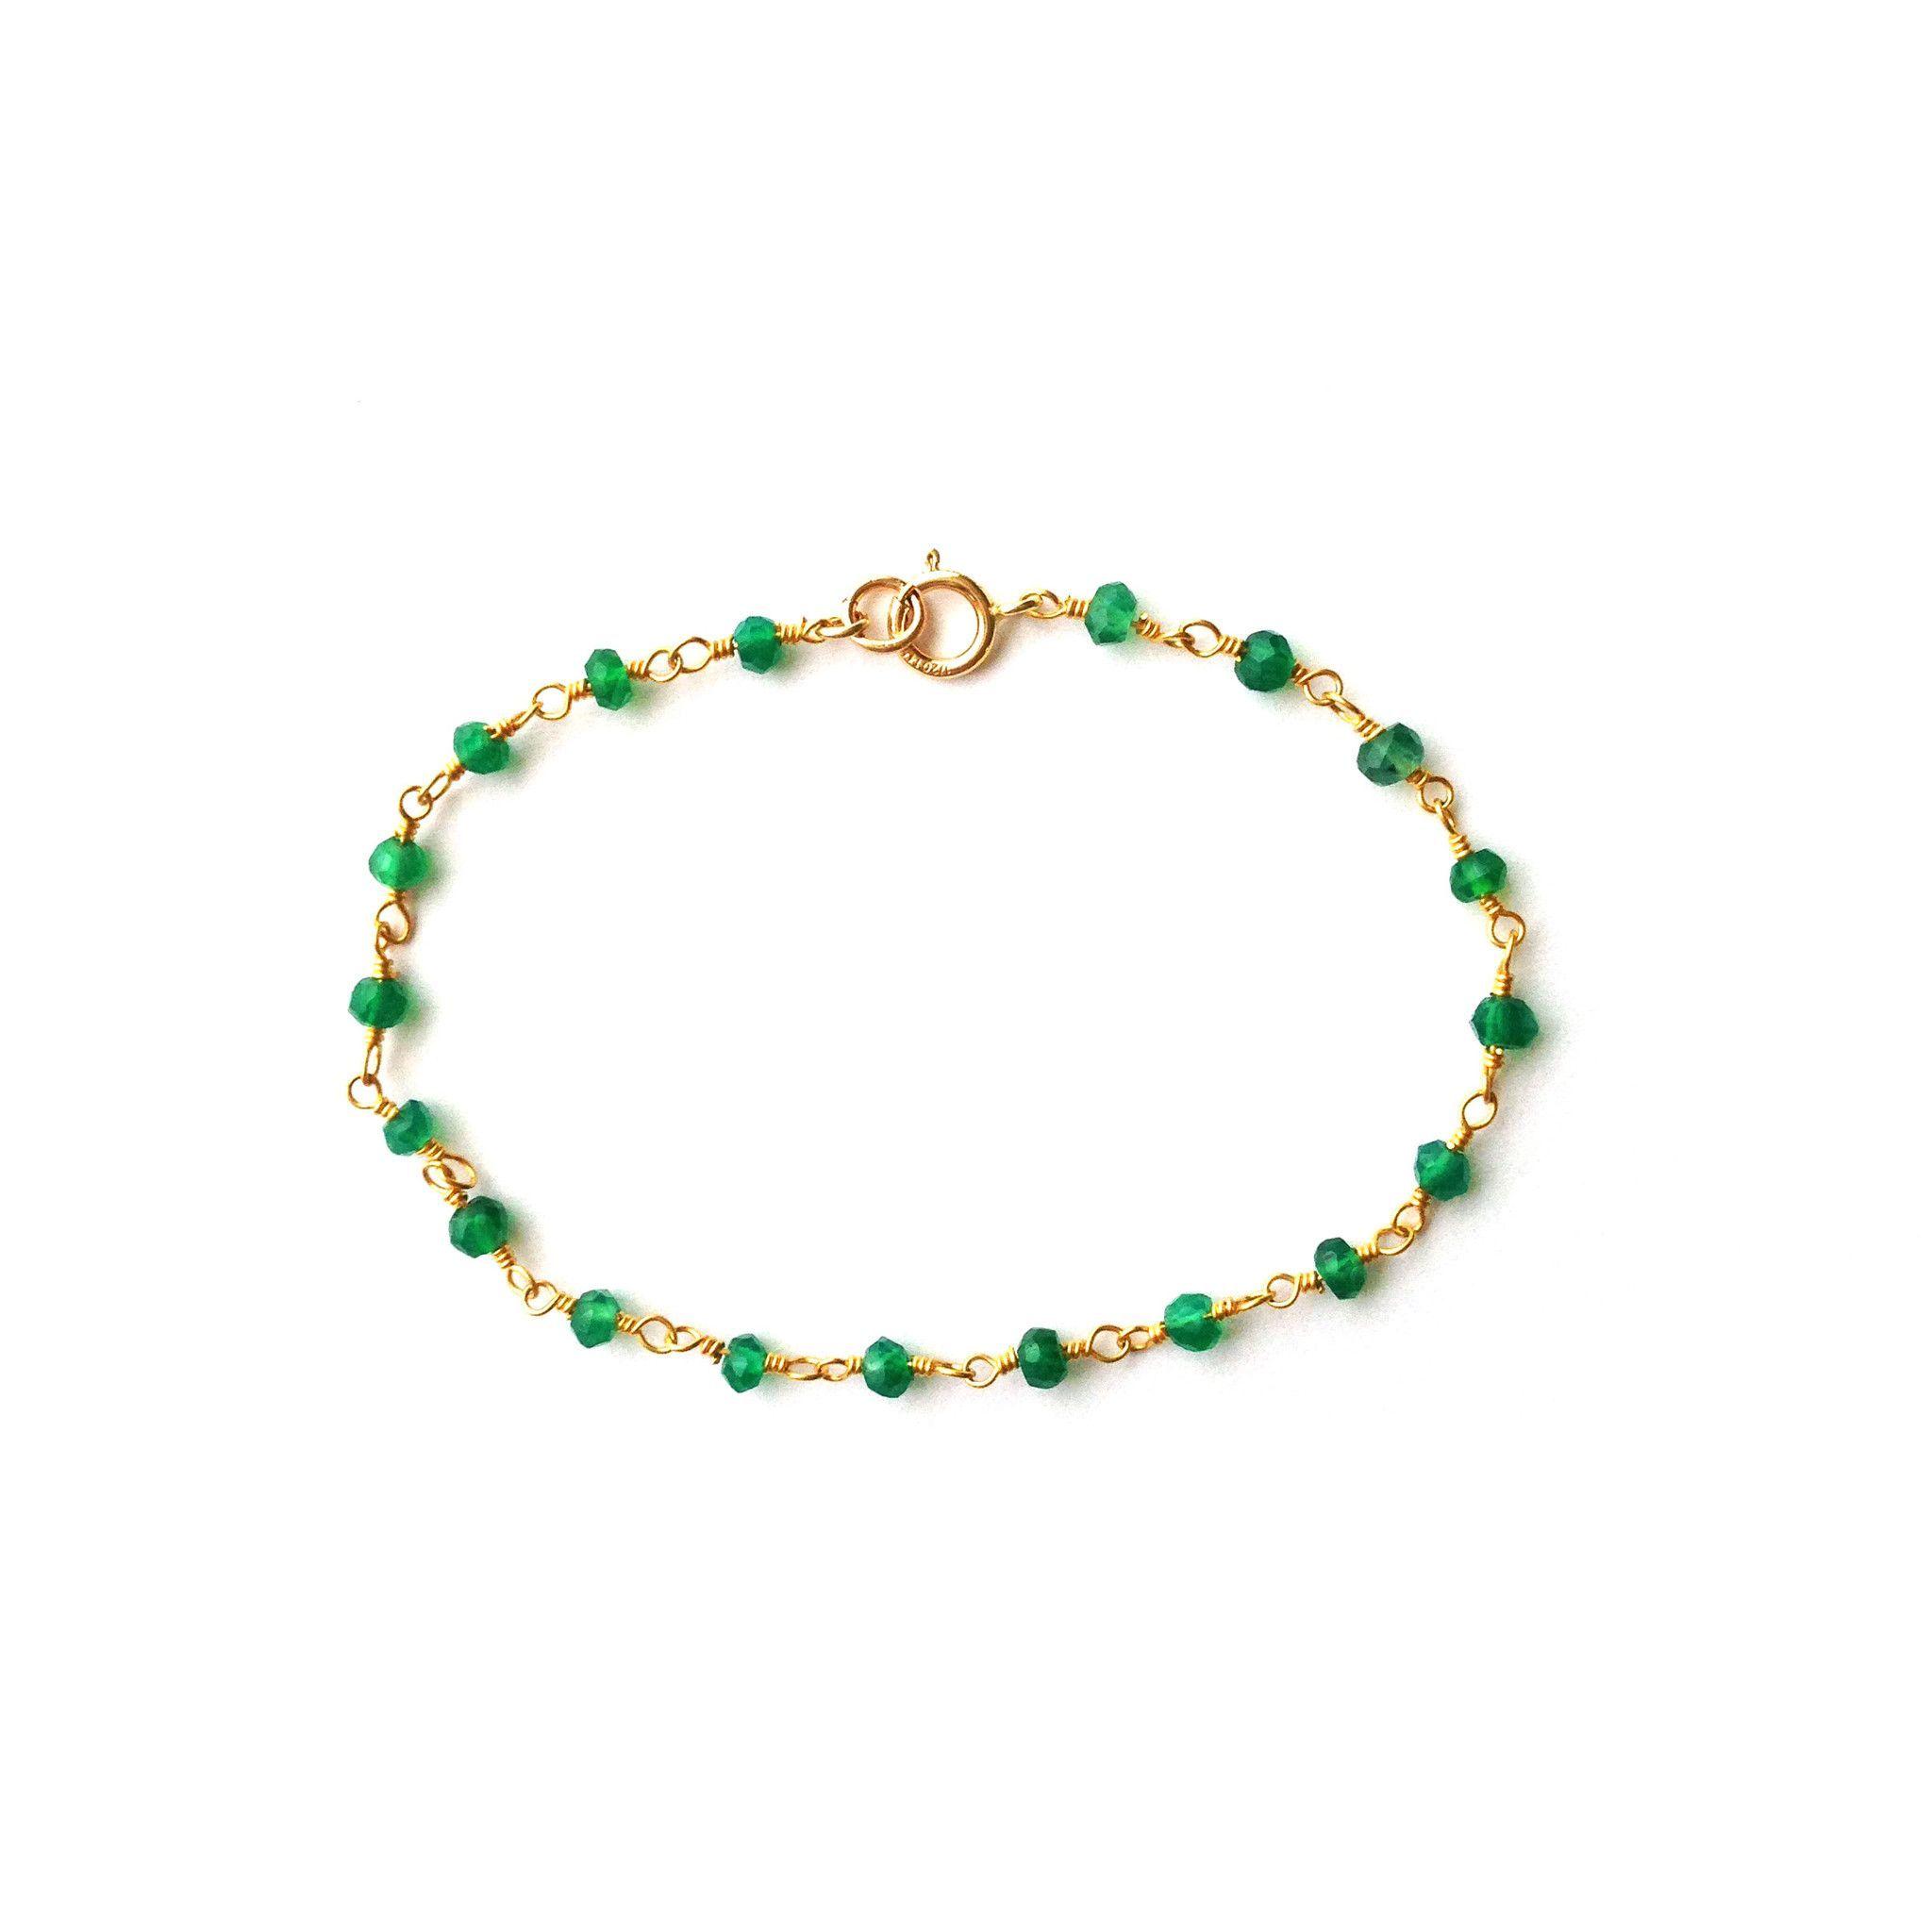 Green Onyx Beaded Bracelet